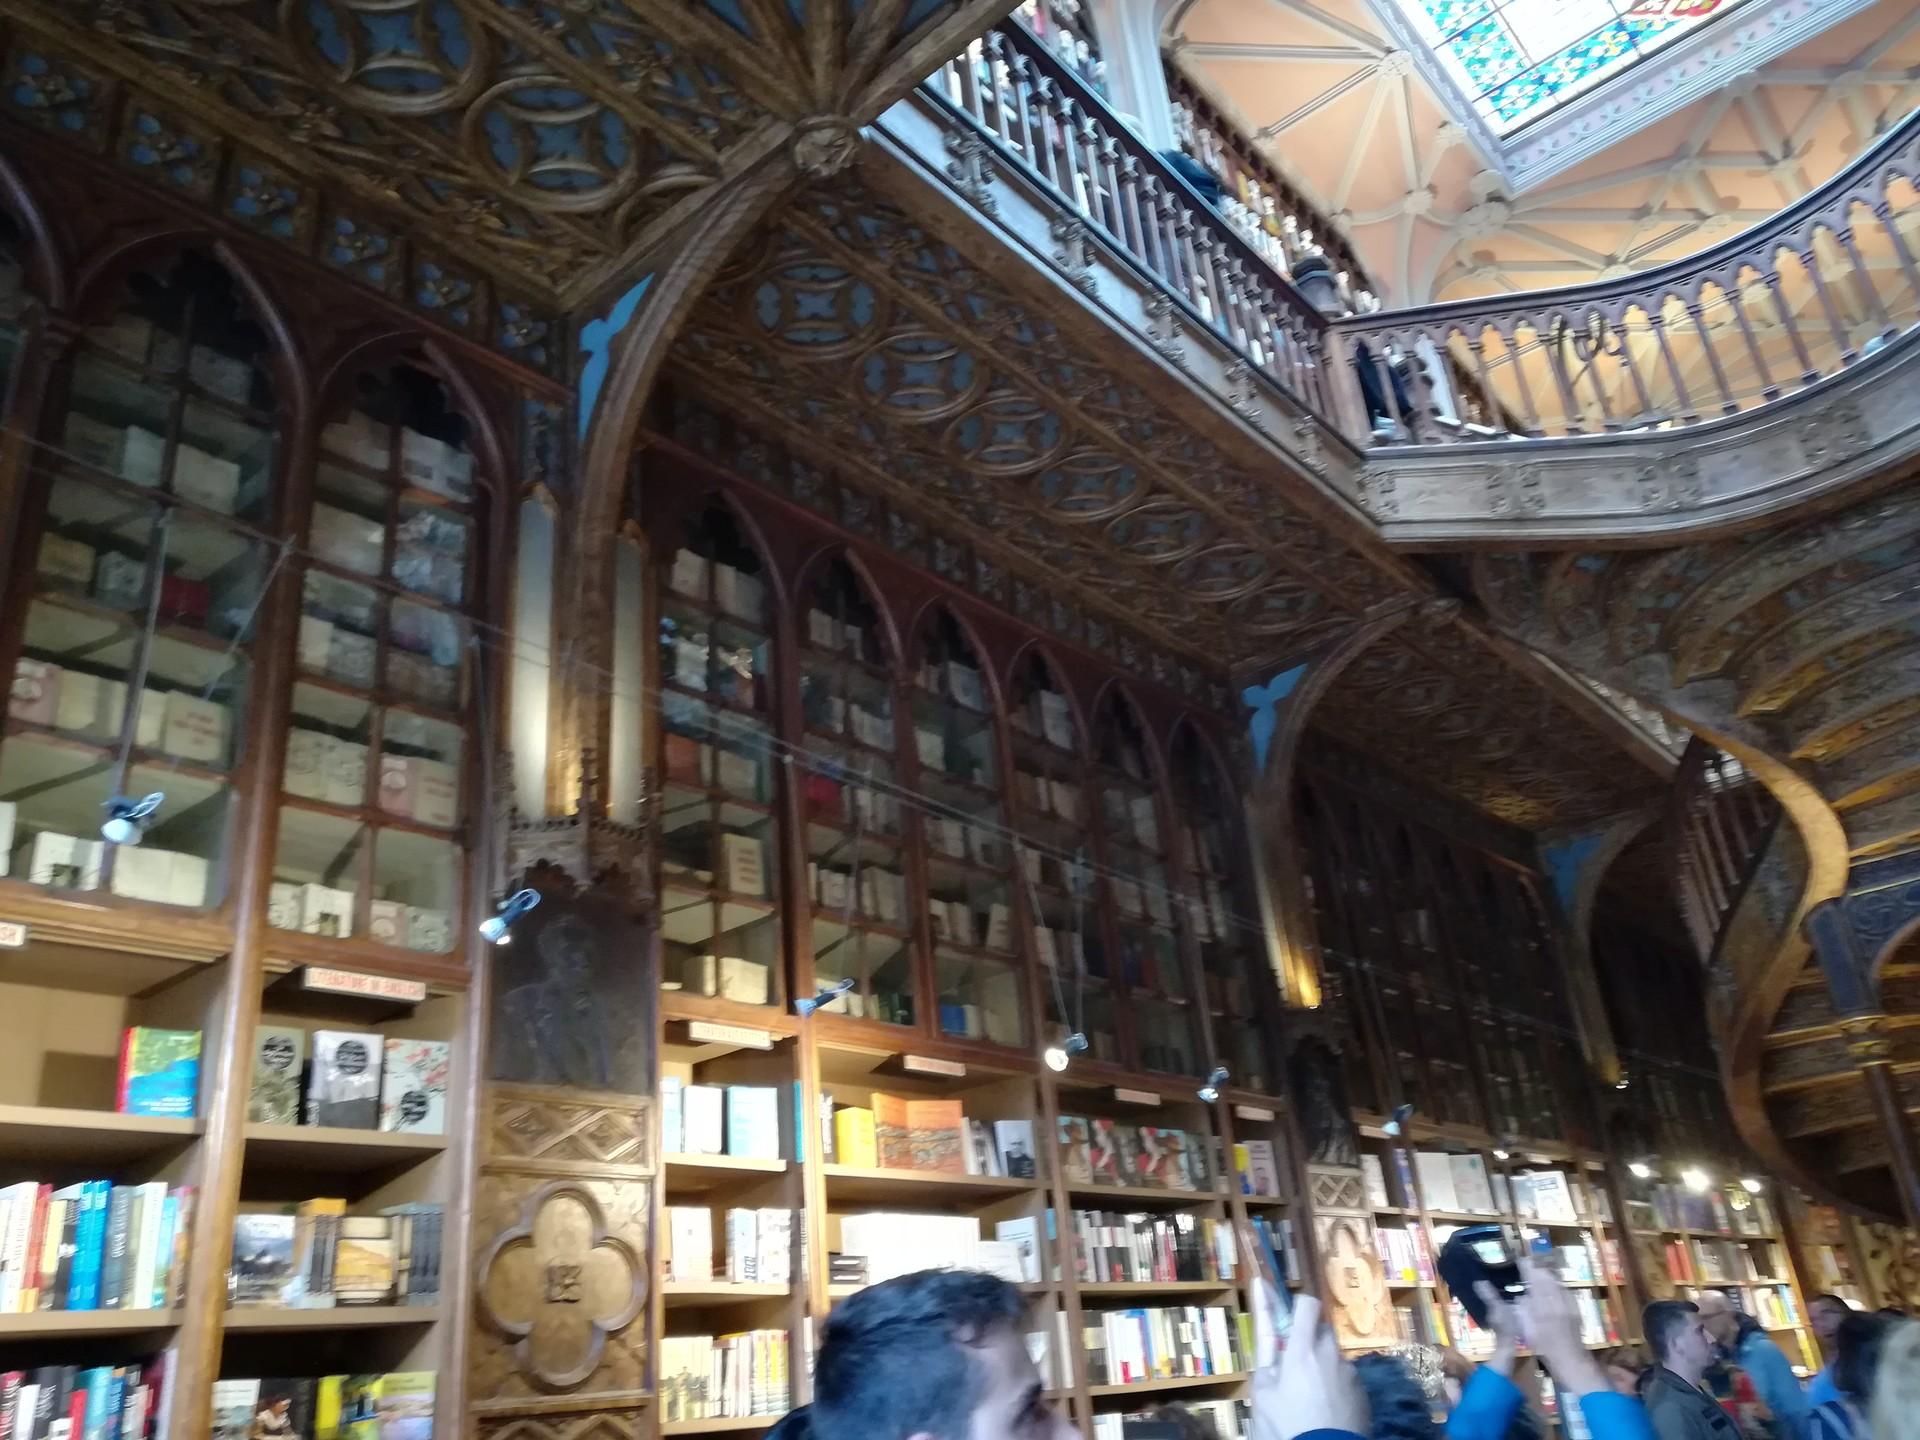 la-librairie-inspire-j-k-rowlings-7ad45bea37fdc6e166efc0020ed87106.jpg